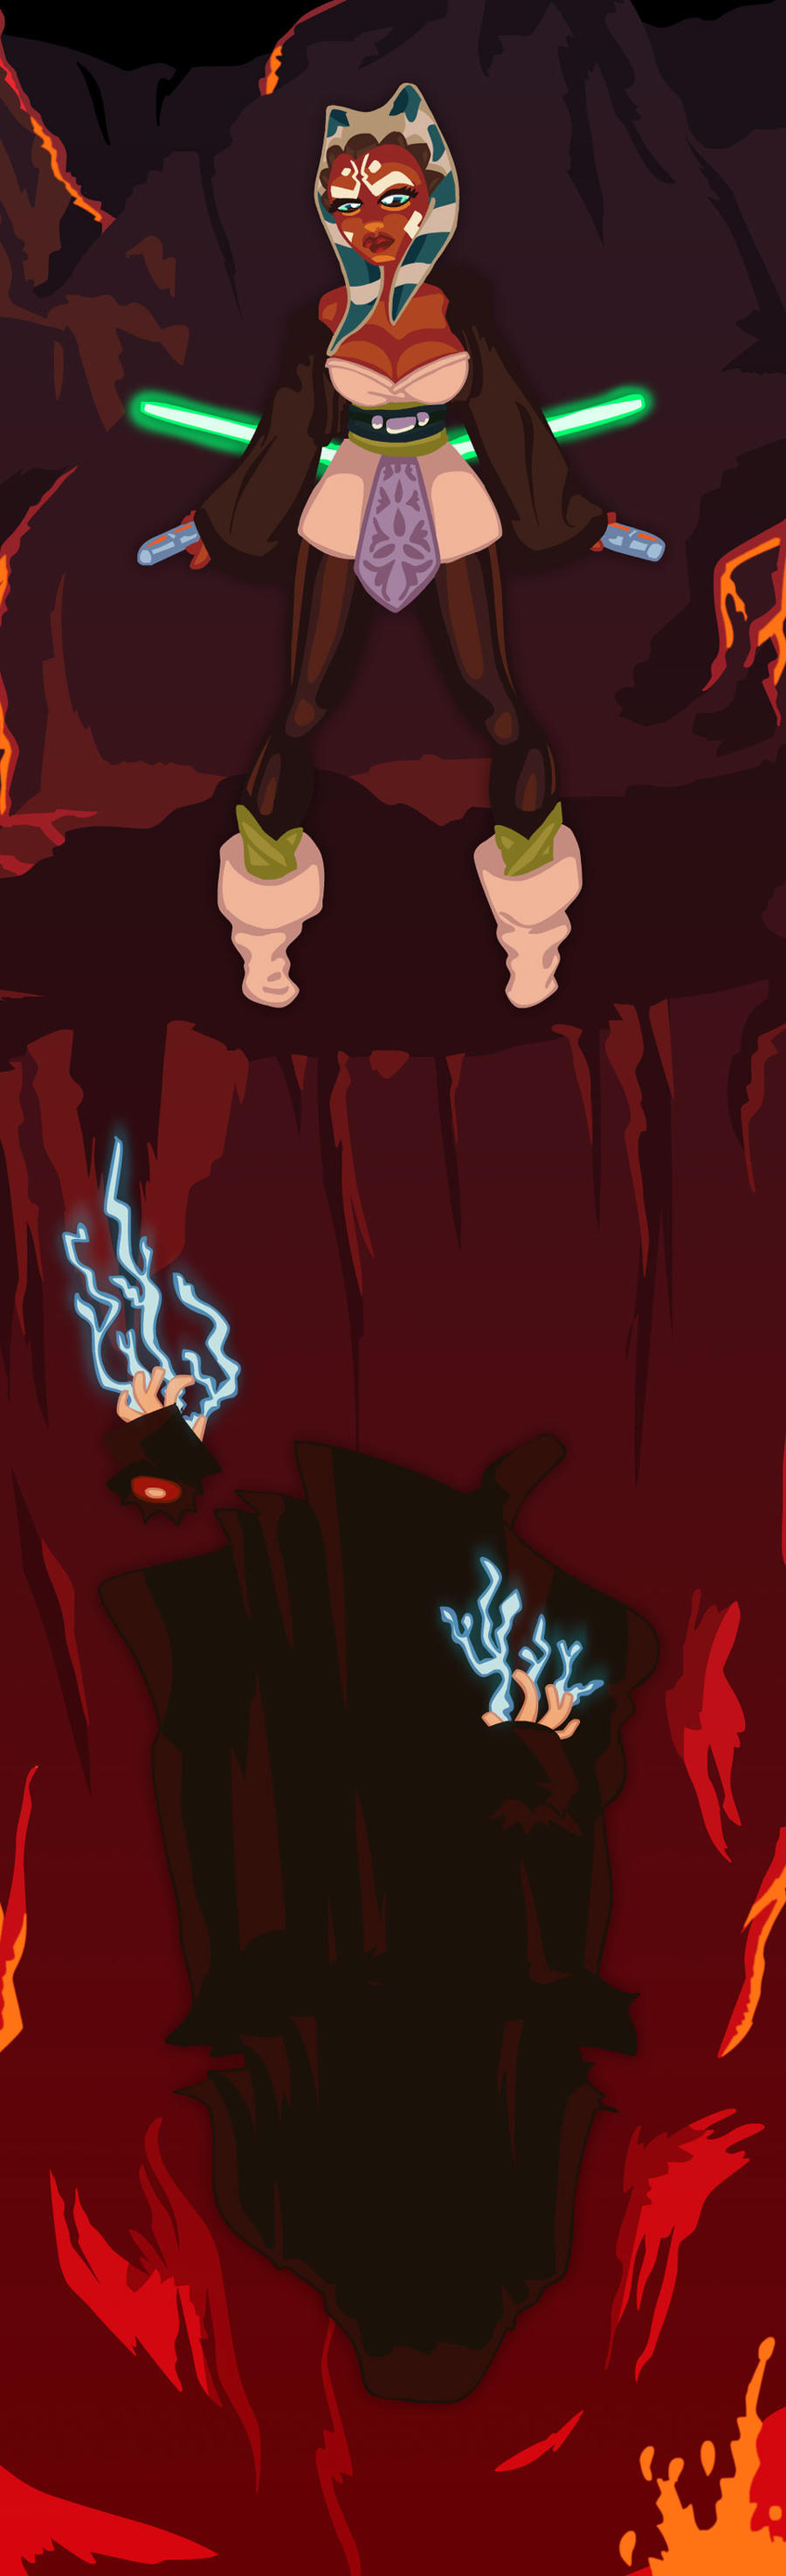 How Darth Sidious Really Died By Juhaszmark